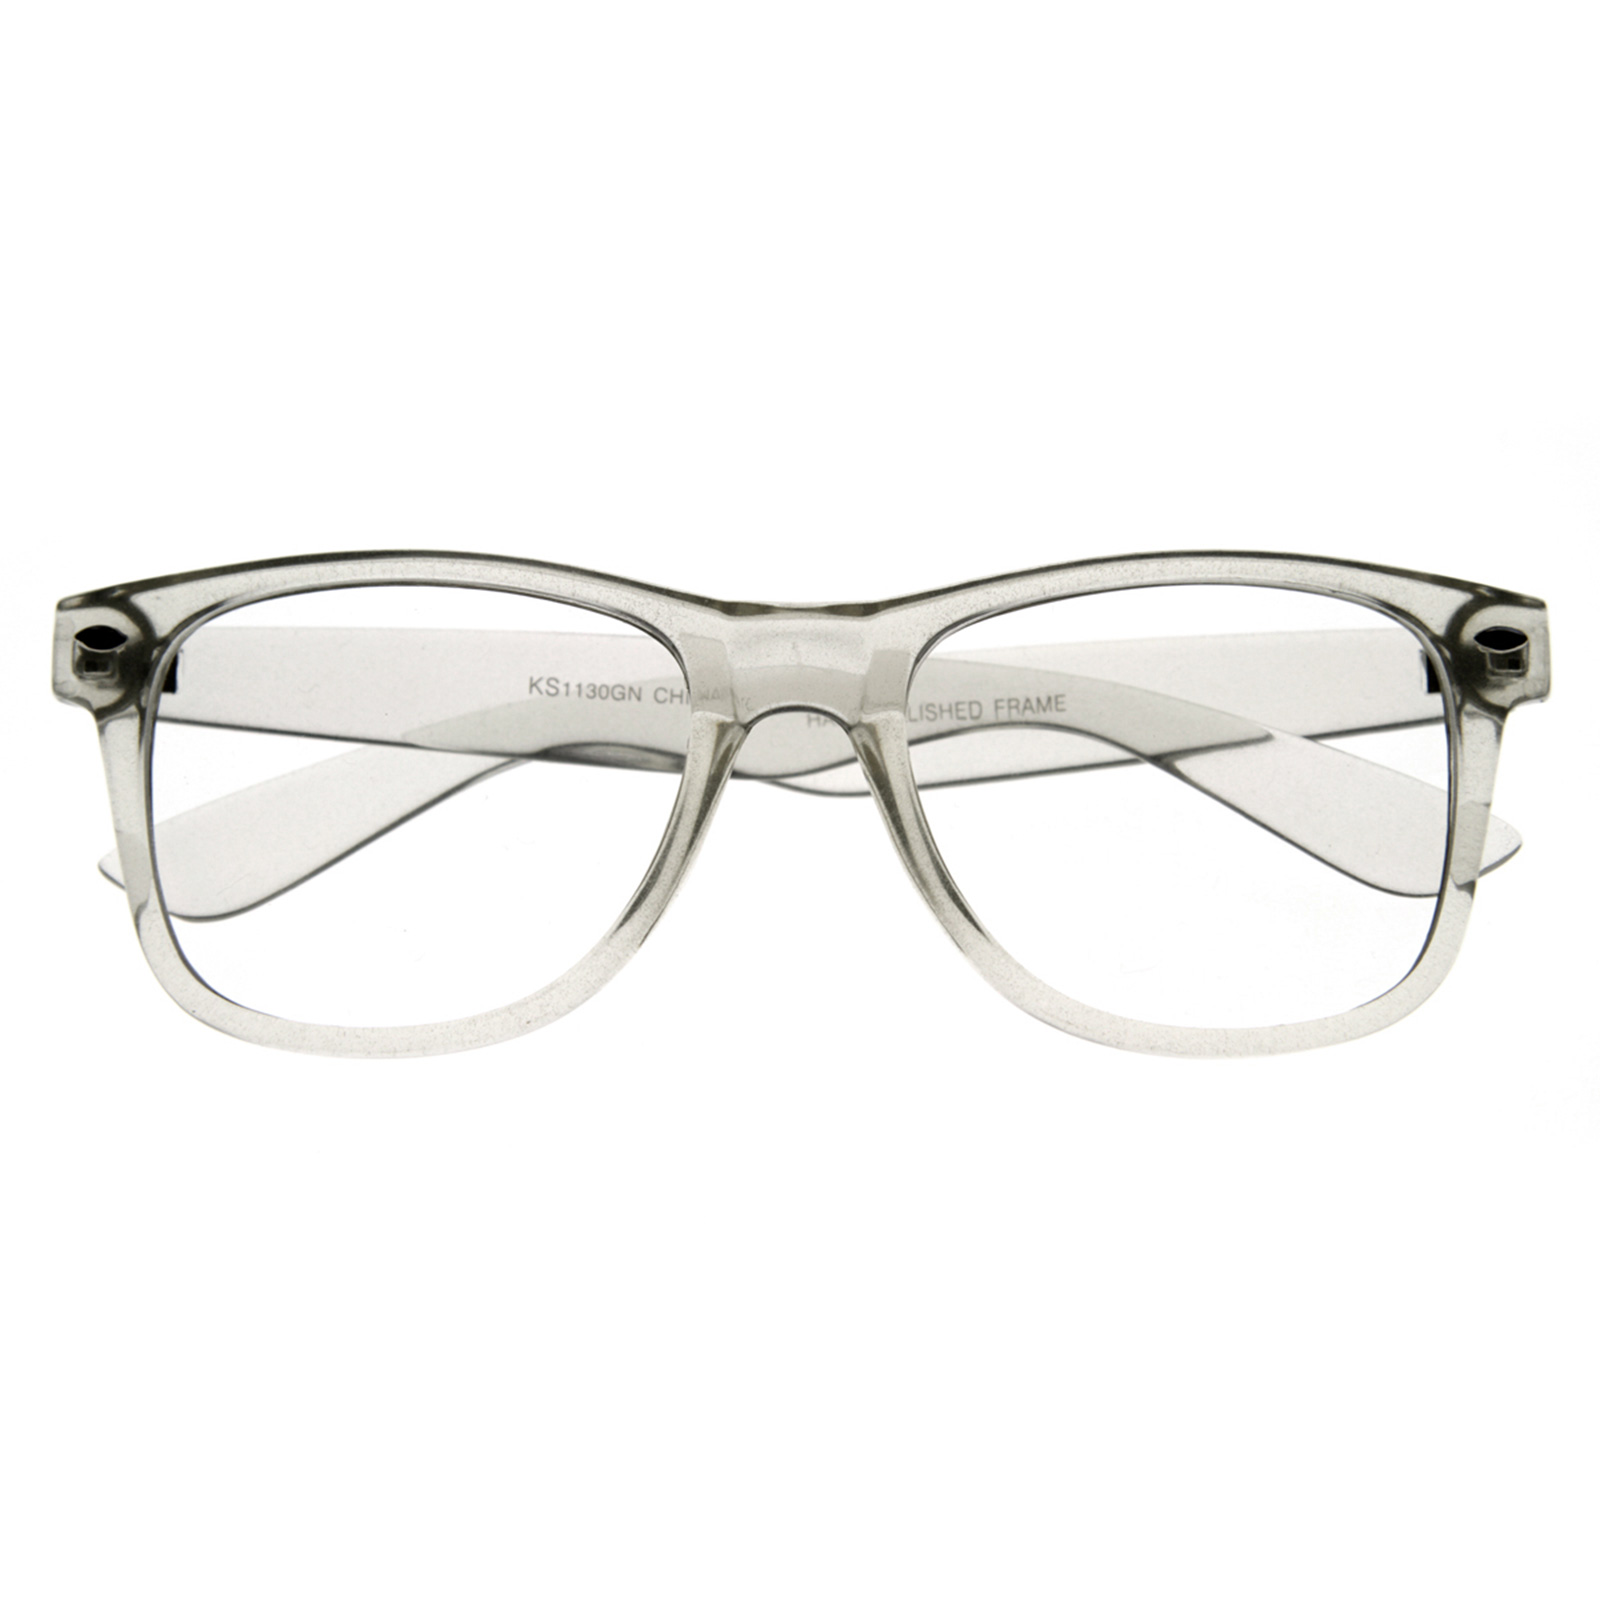 Glasses Frame Clear : Clear Transparent Translucent Crystal Frame Clear Lens ...